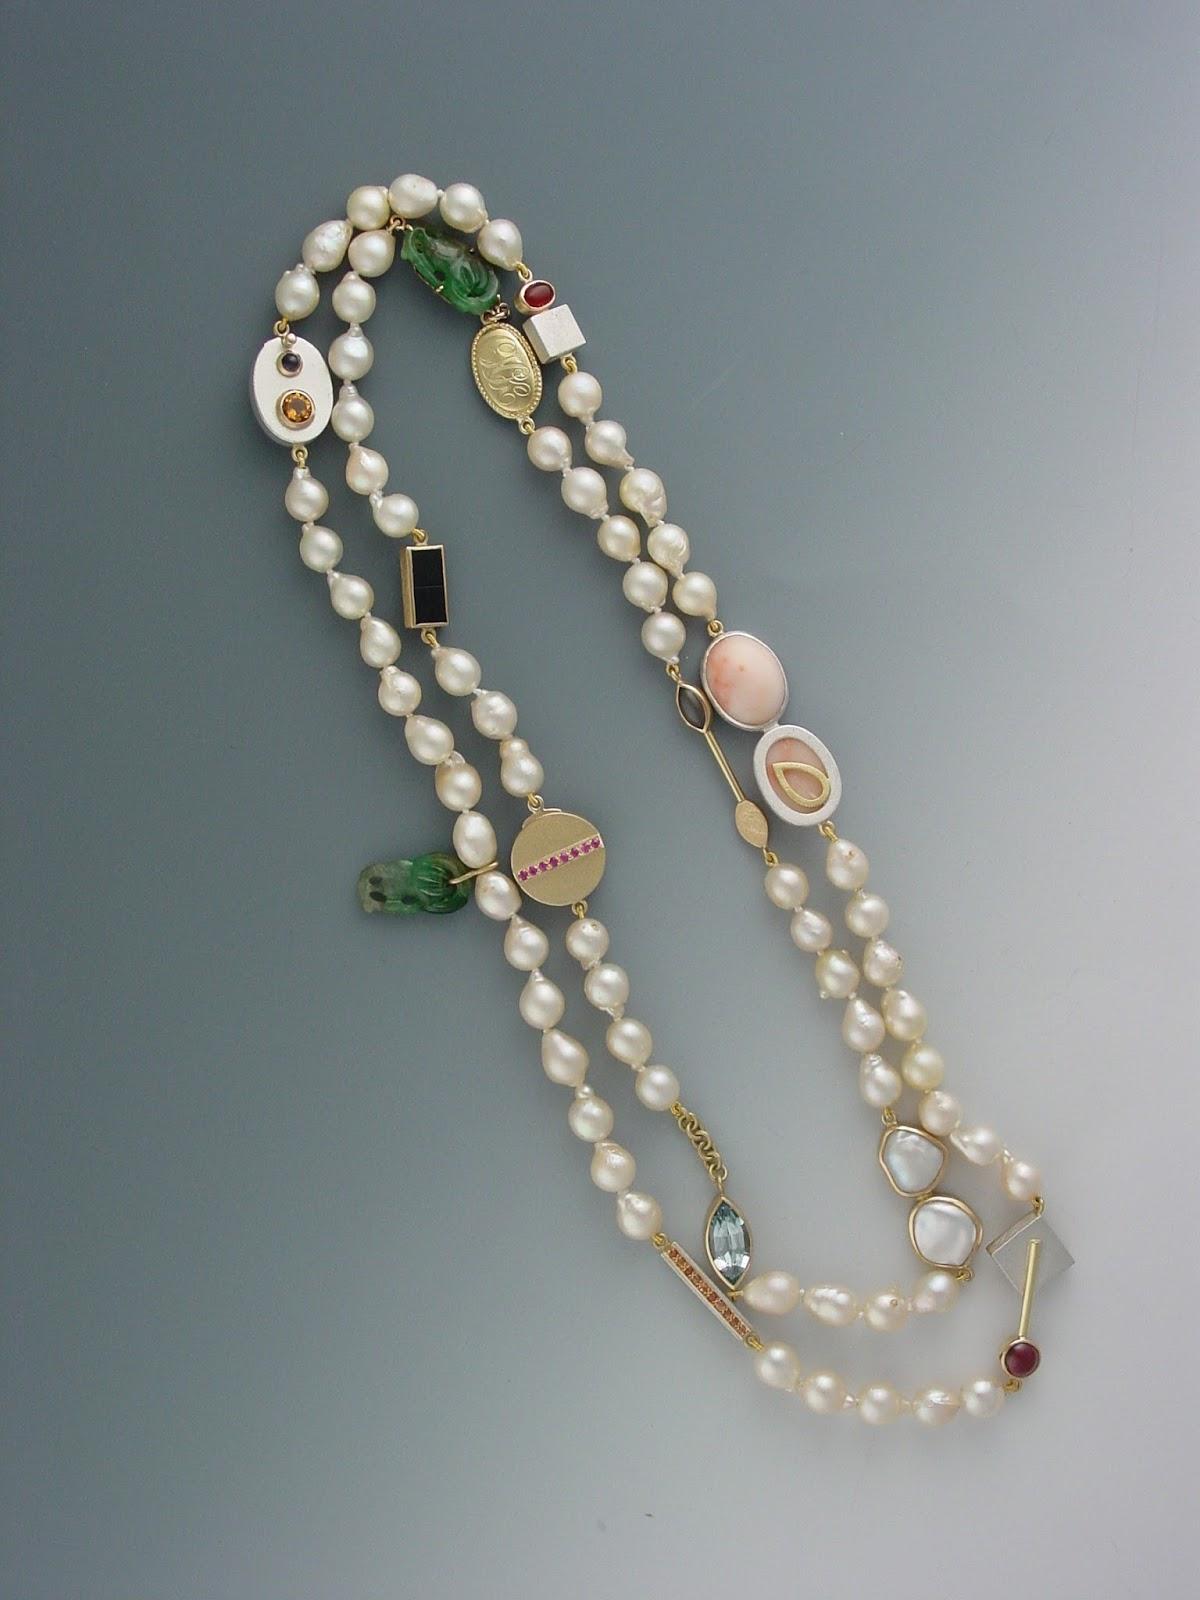 Pearl Renos Supreme Janis Kerman Passage Des Perles